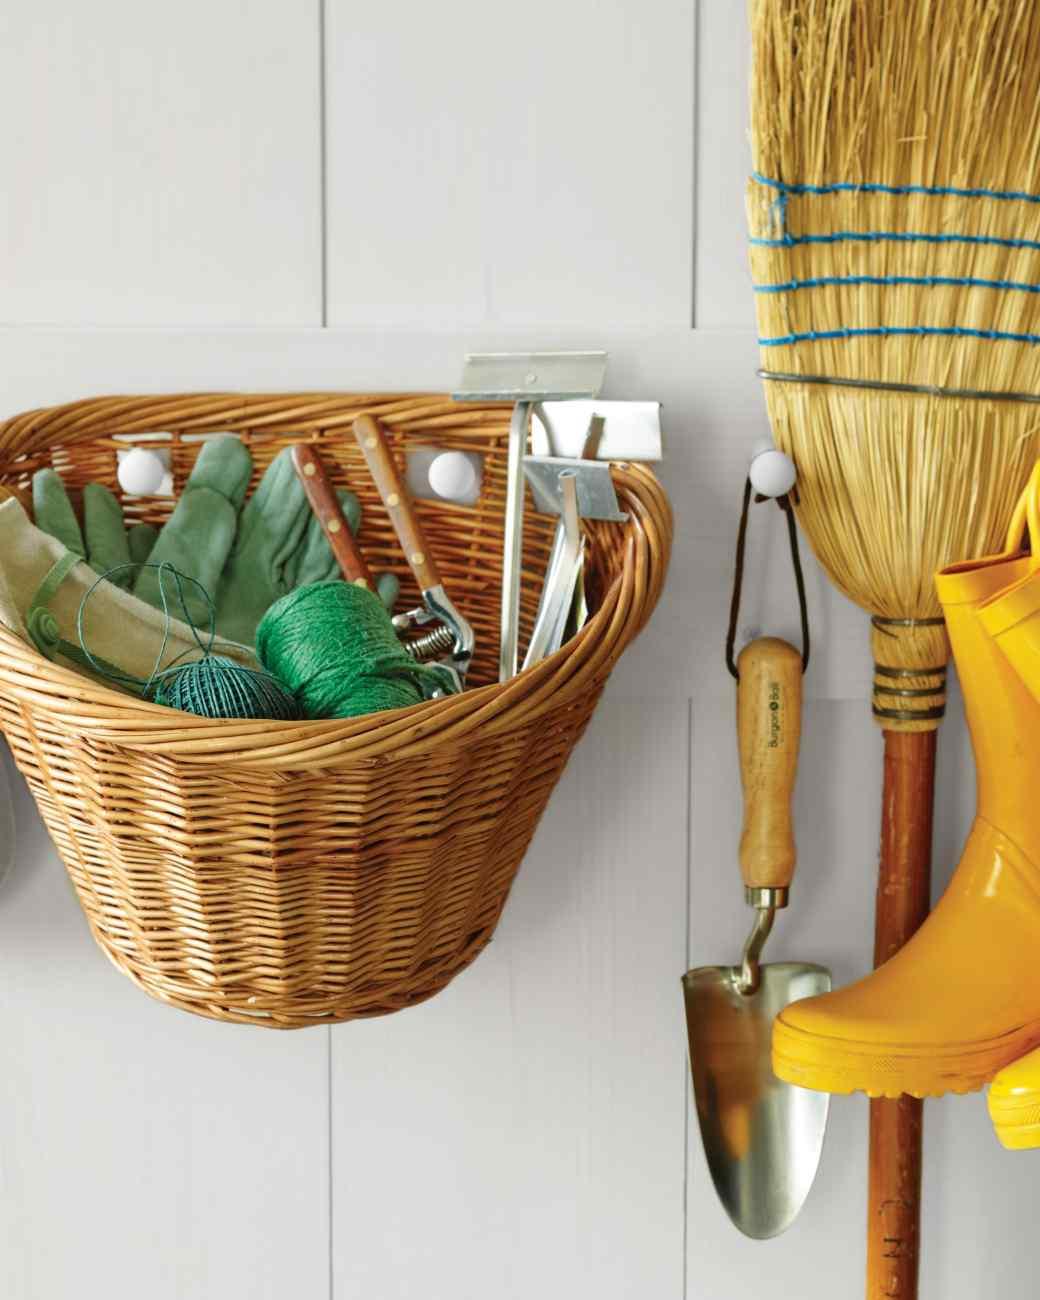 16 genius garden tool organization ideas. Black Bedroom Furniture Sets. Home Design Ideas